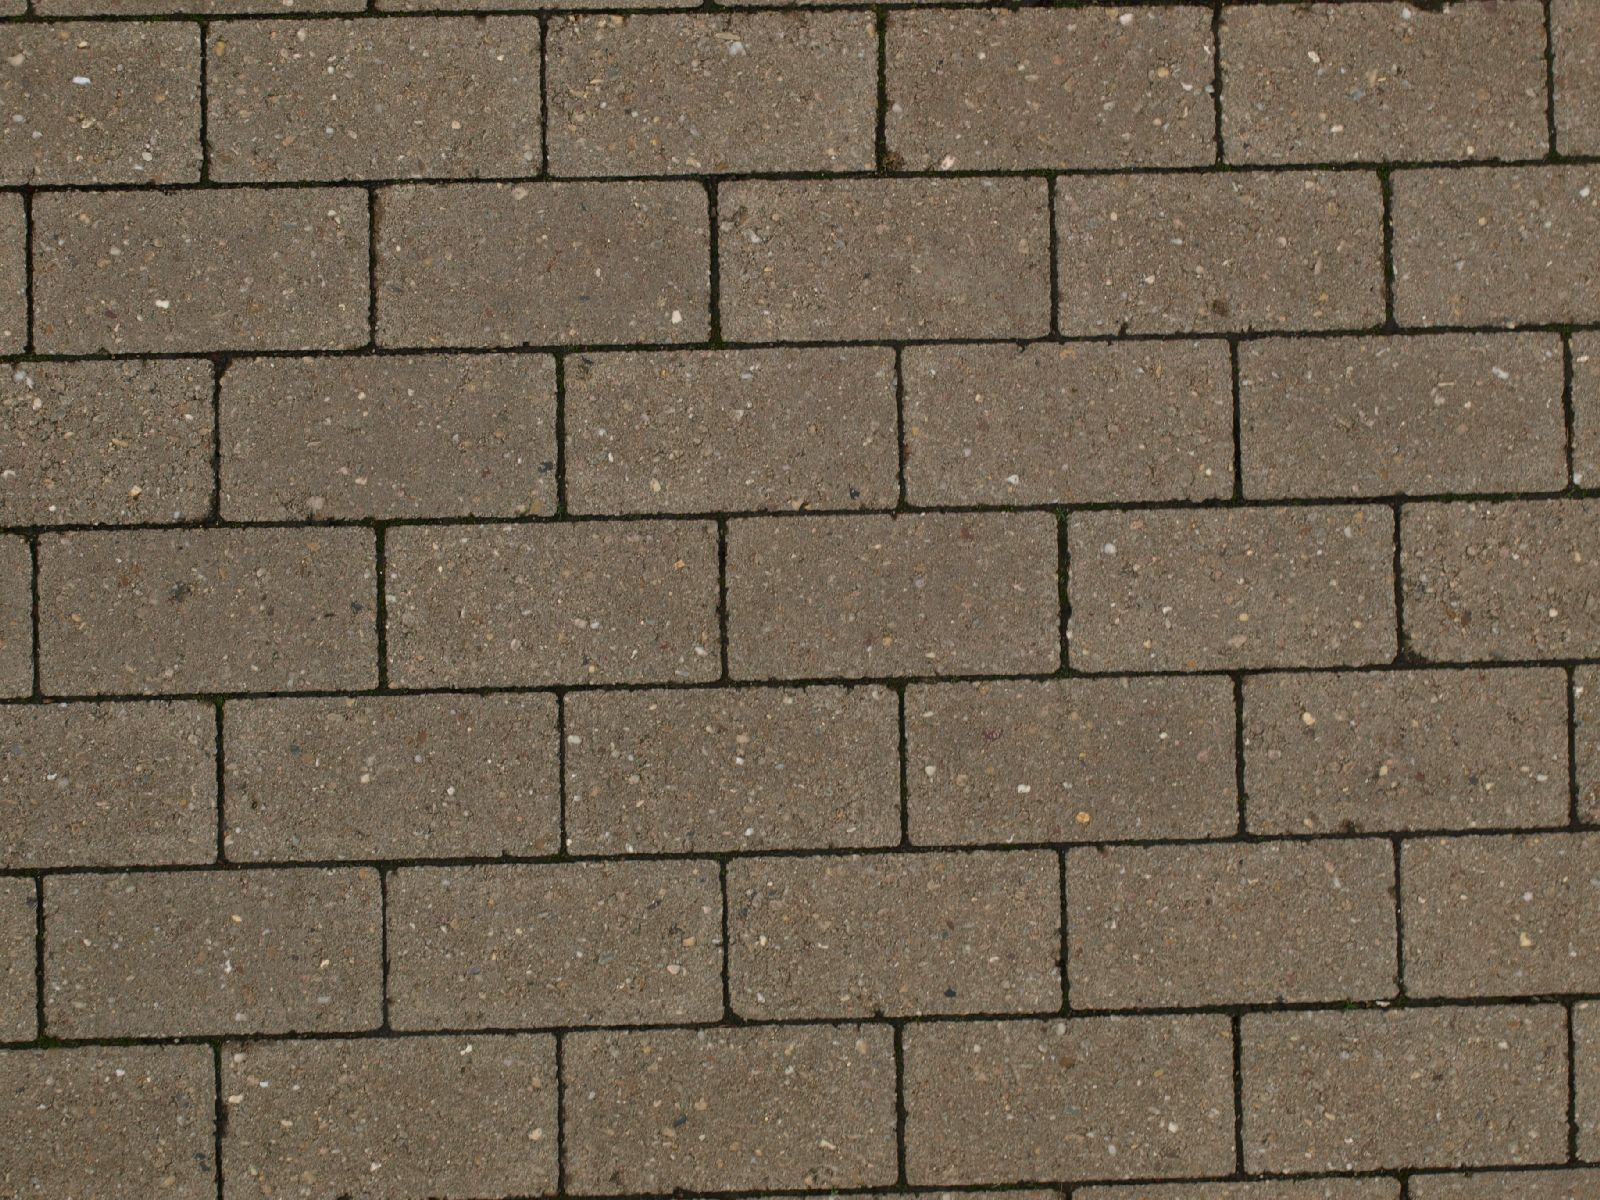 Ground-Urban_Texture_A_PC041398